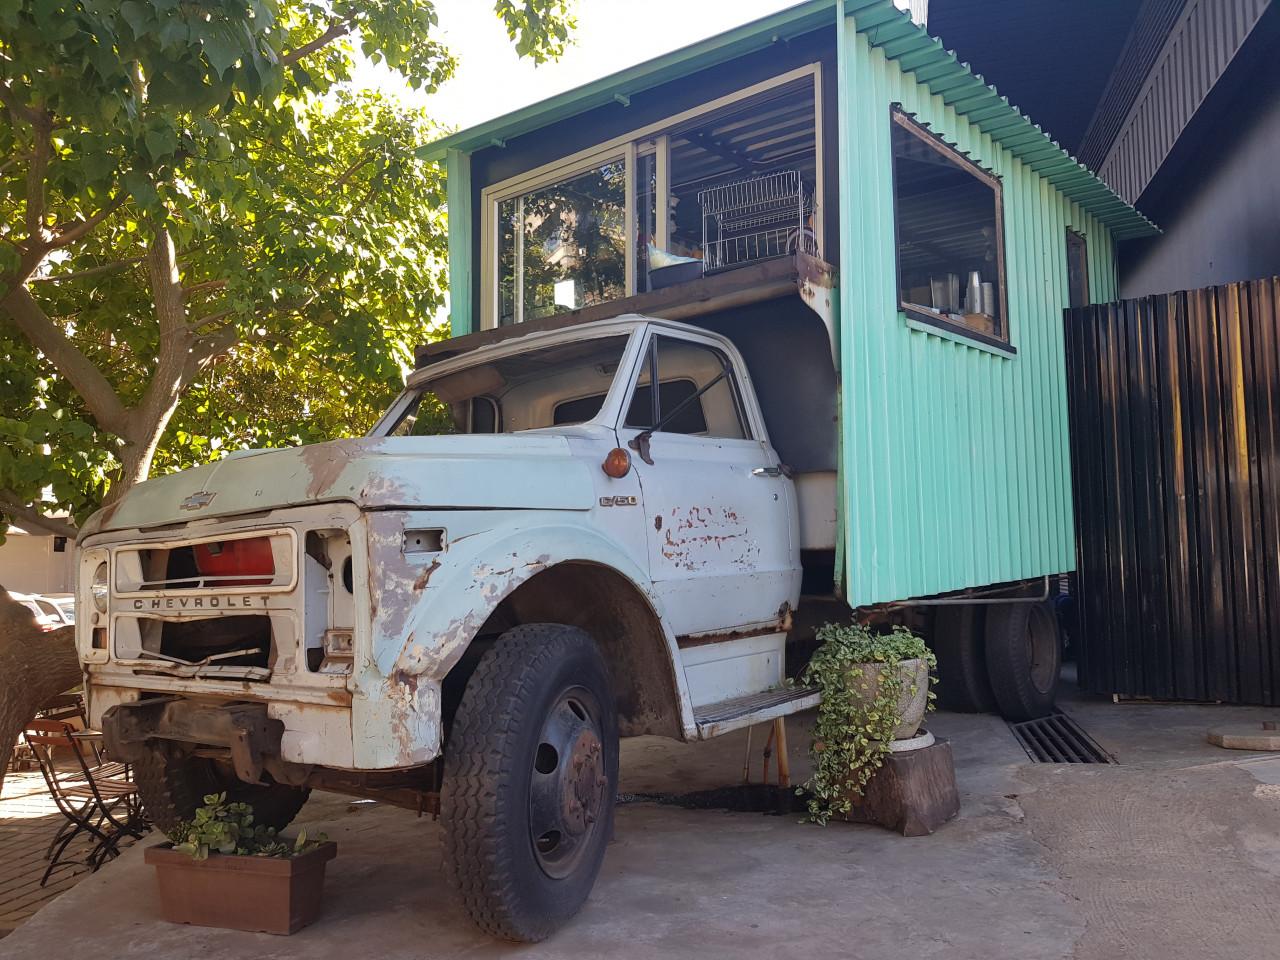 Food truck dans le quartier de Maboneng. (© Chloé OBARA))